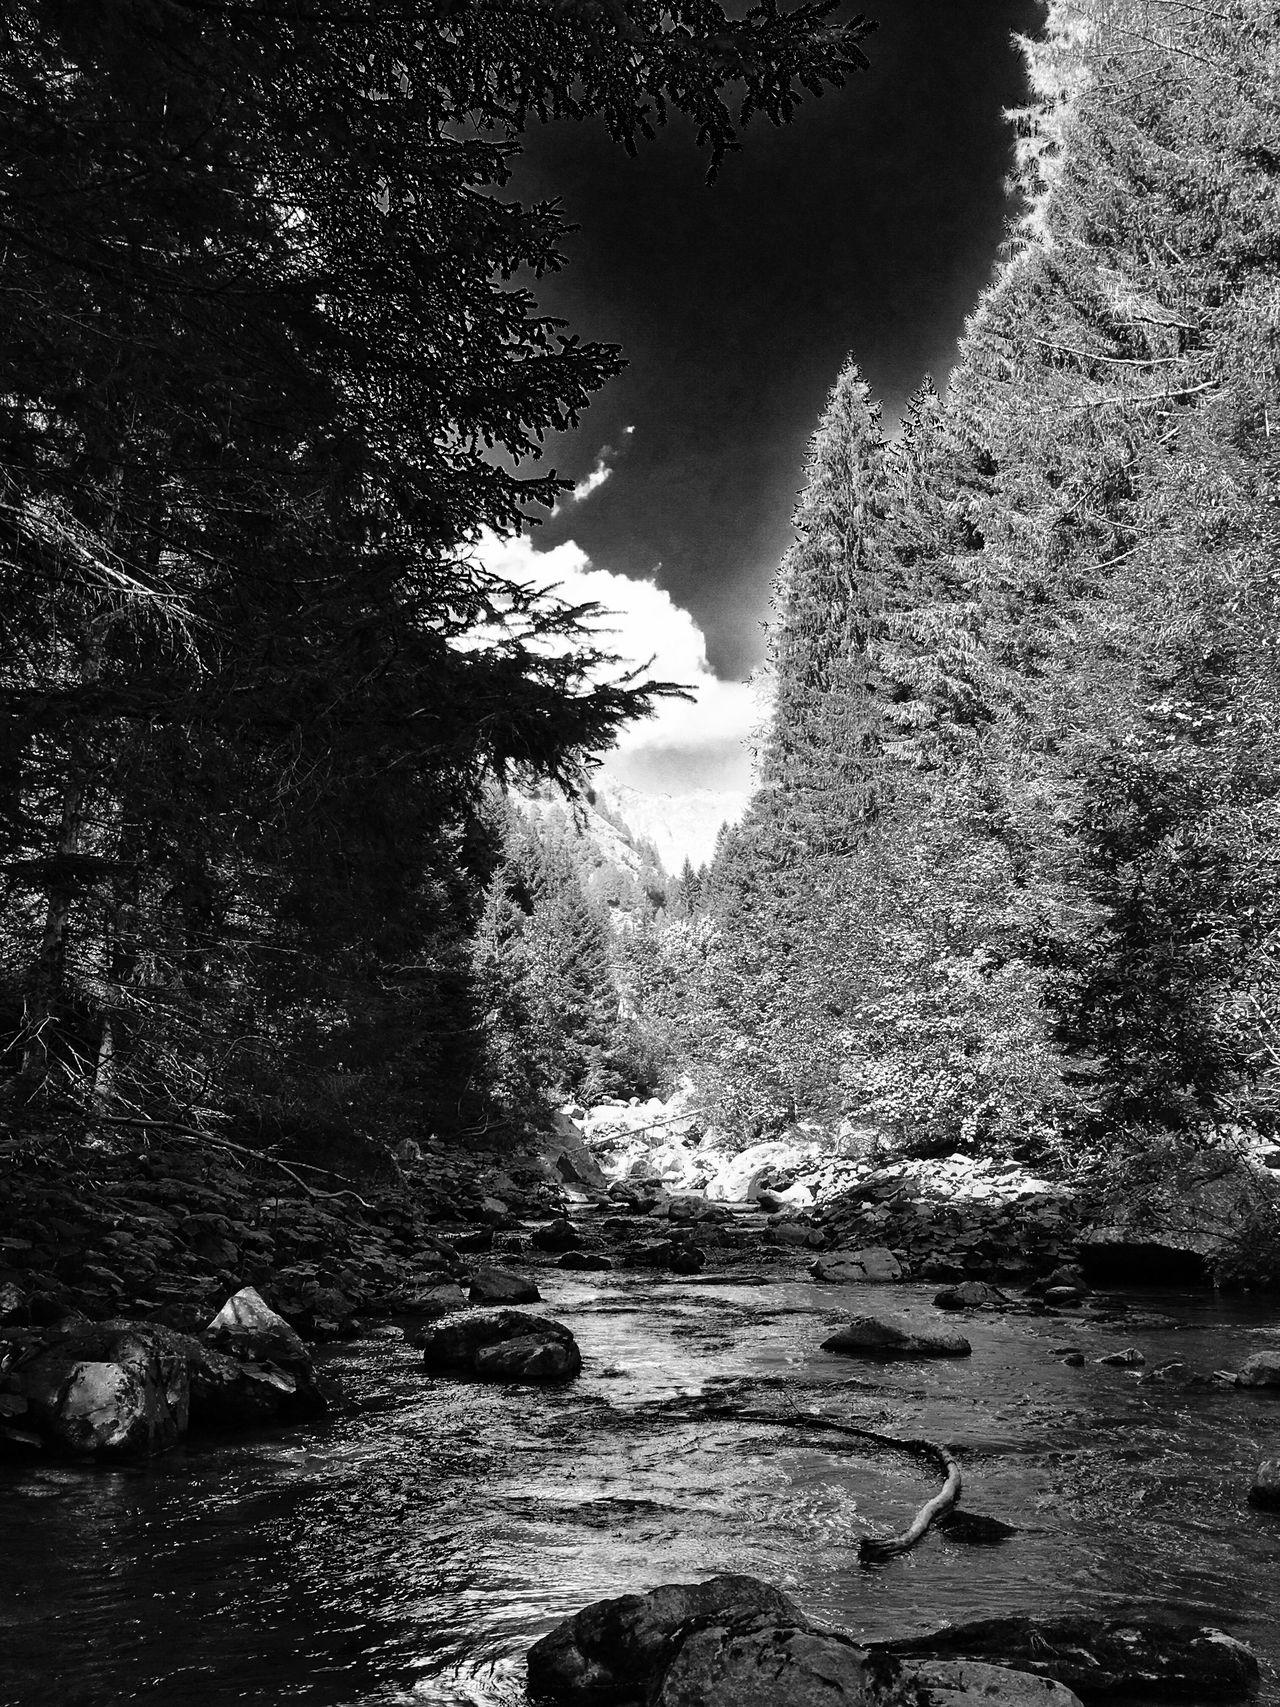 Mountain Nature Blackandwhite Scenics Tranquil Scene Beauty In Nature Non-urban Scene Rock Water WoodLand